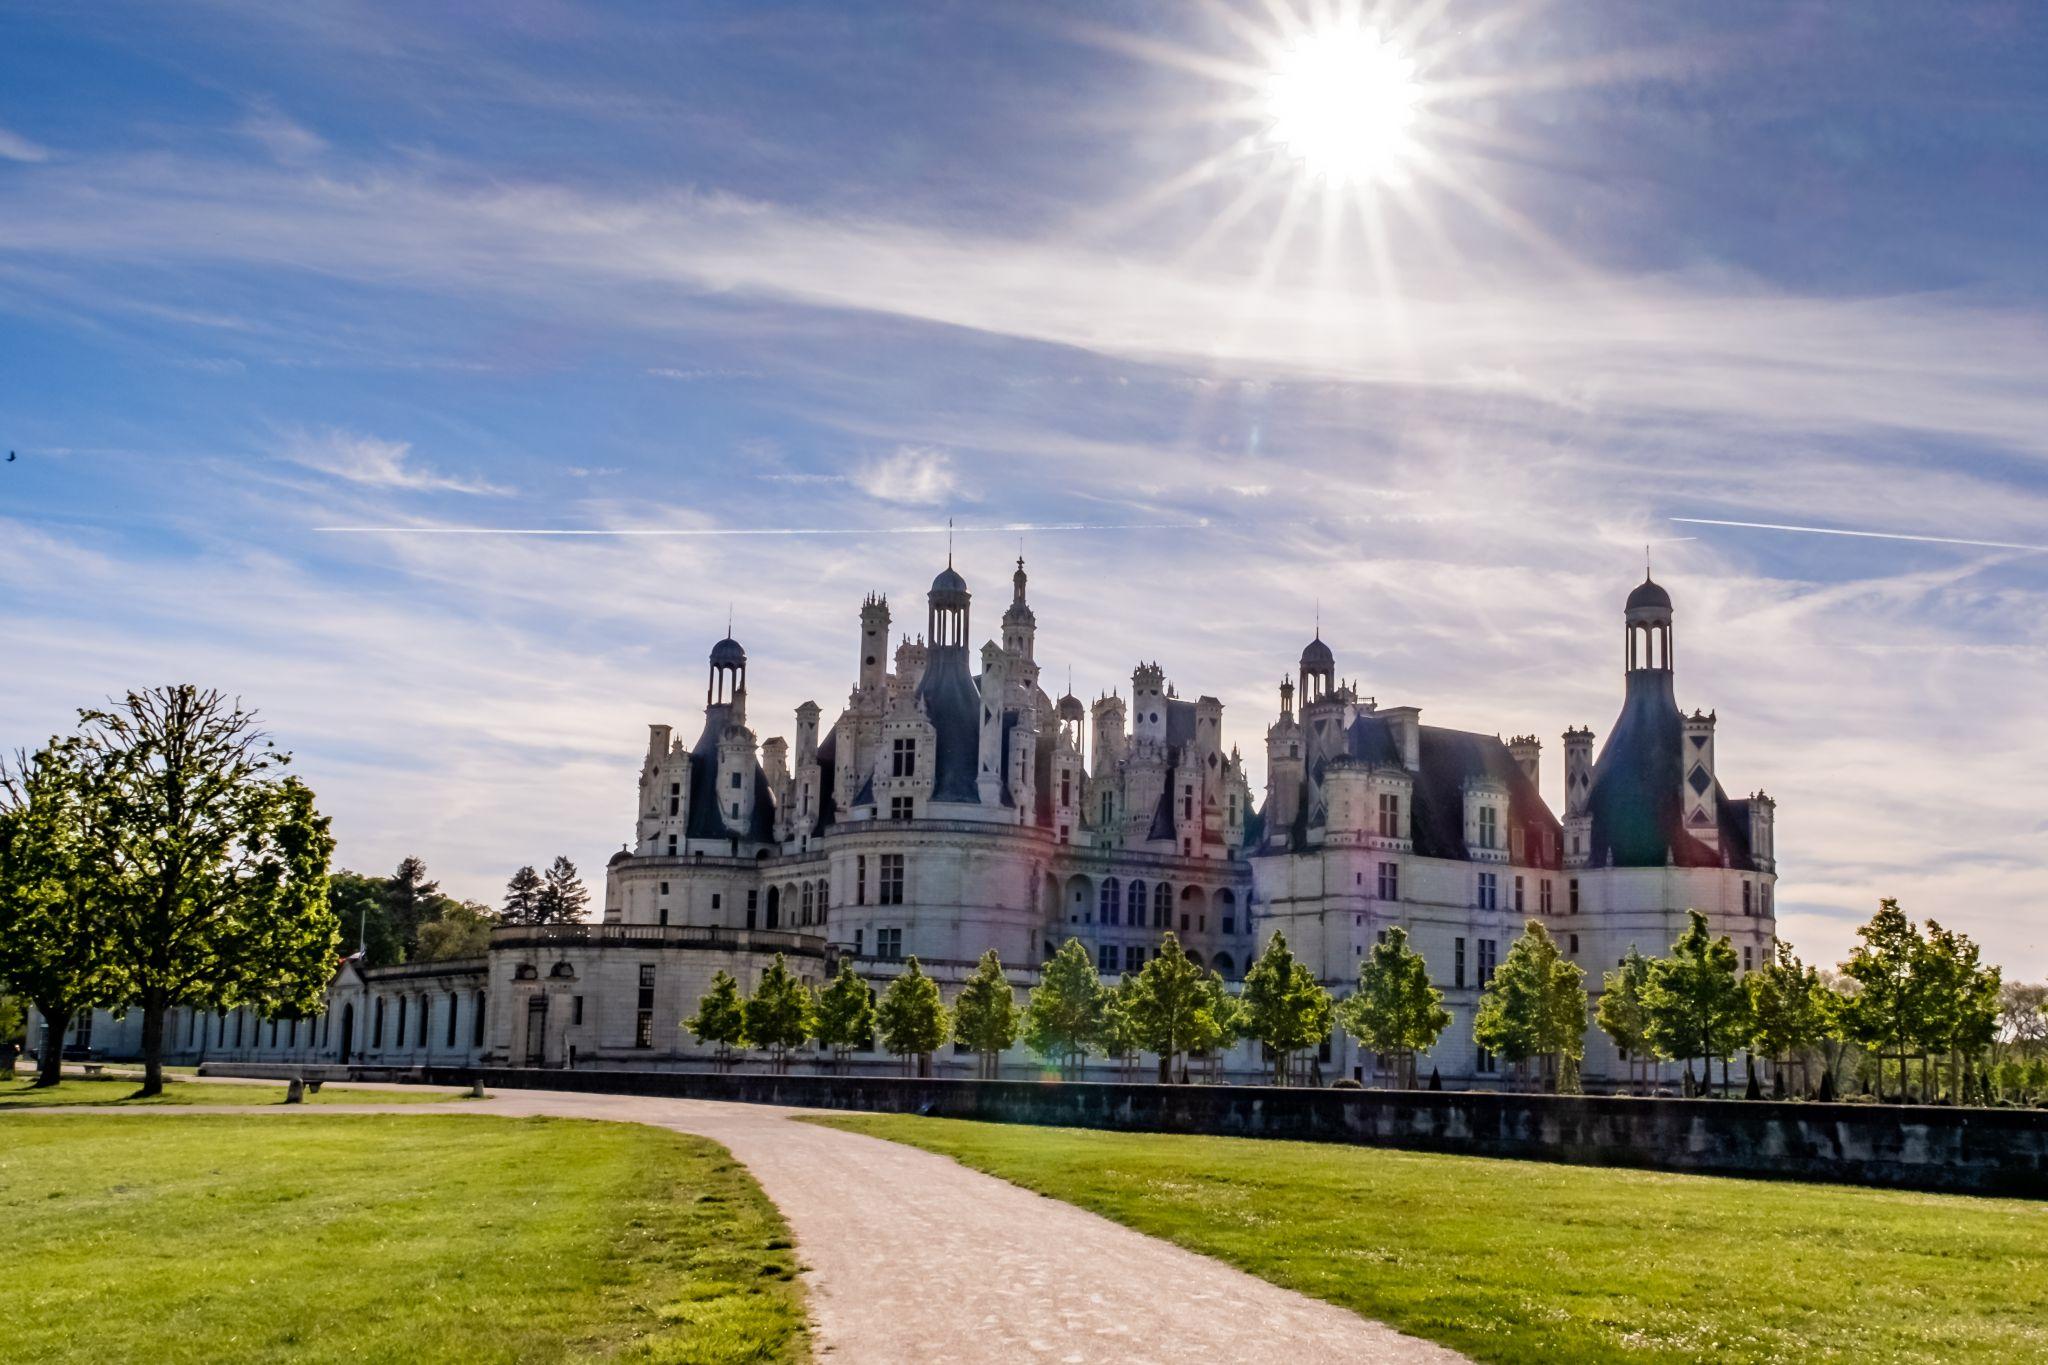 Alternate view of Chateau de Chambord, France